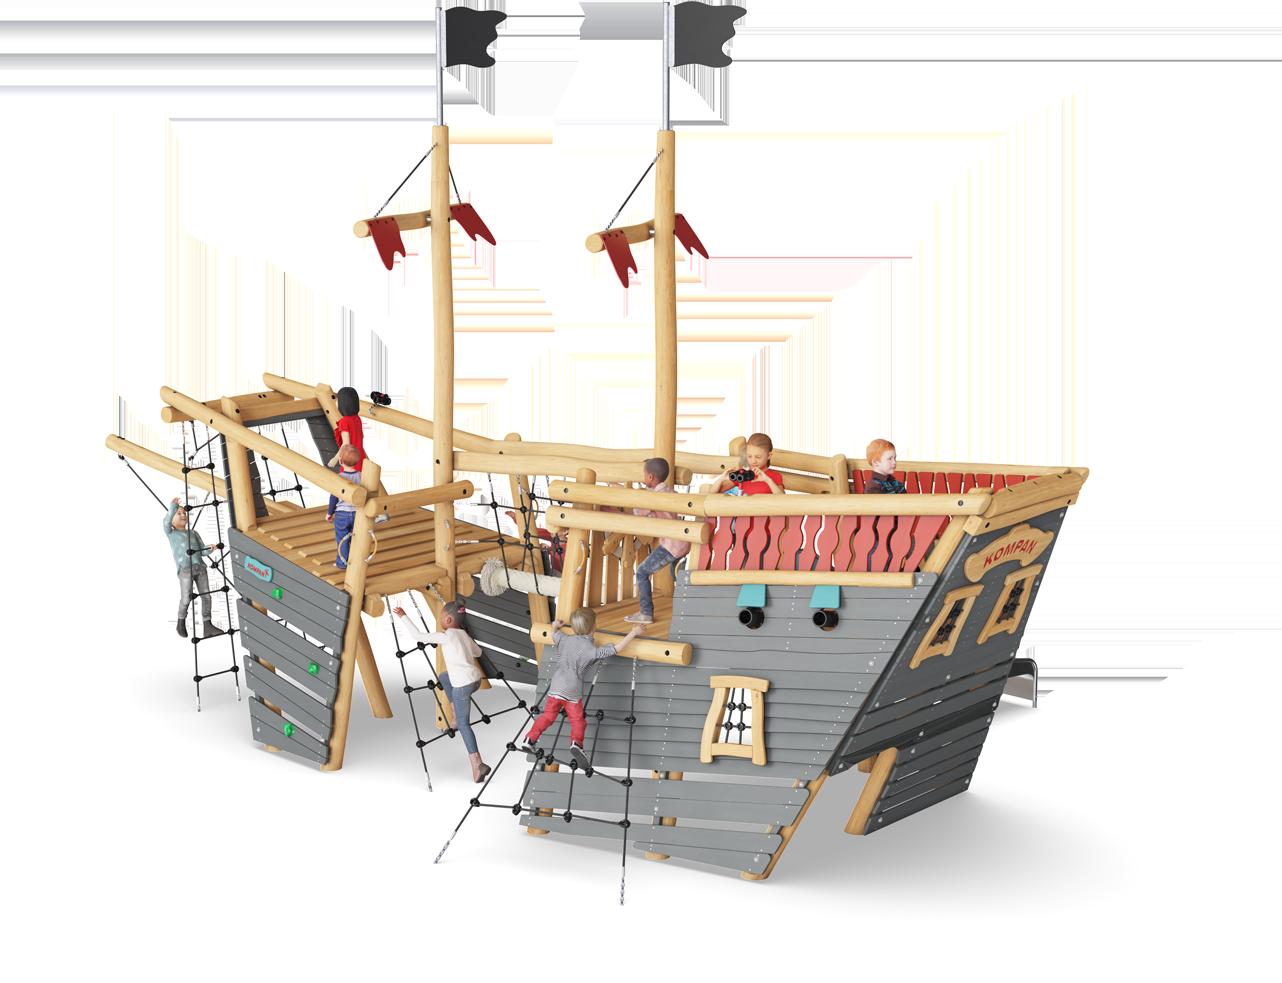 Bateau pirate-NRO540-Kompan